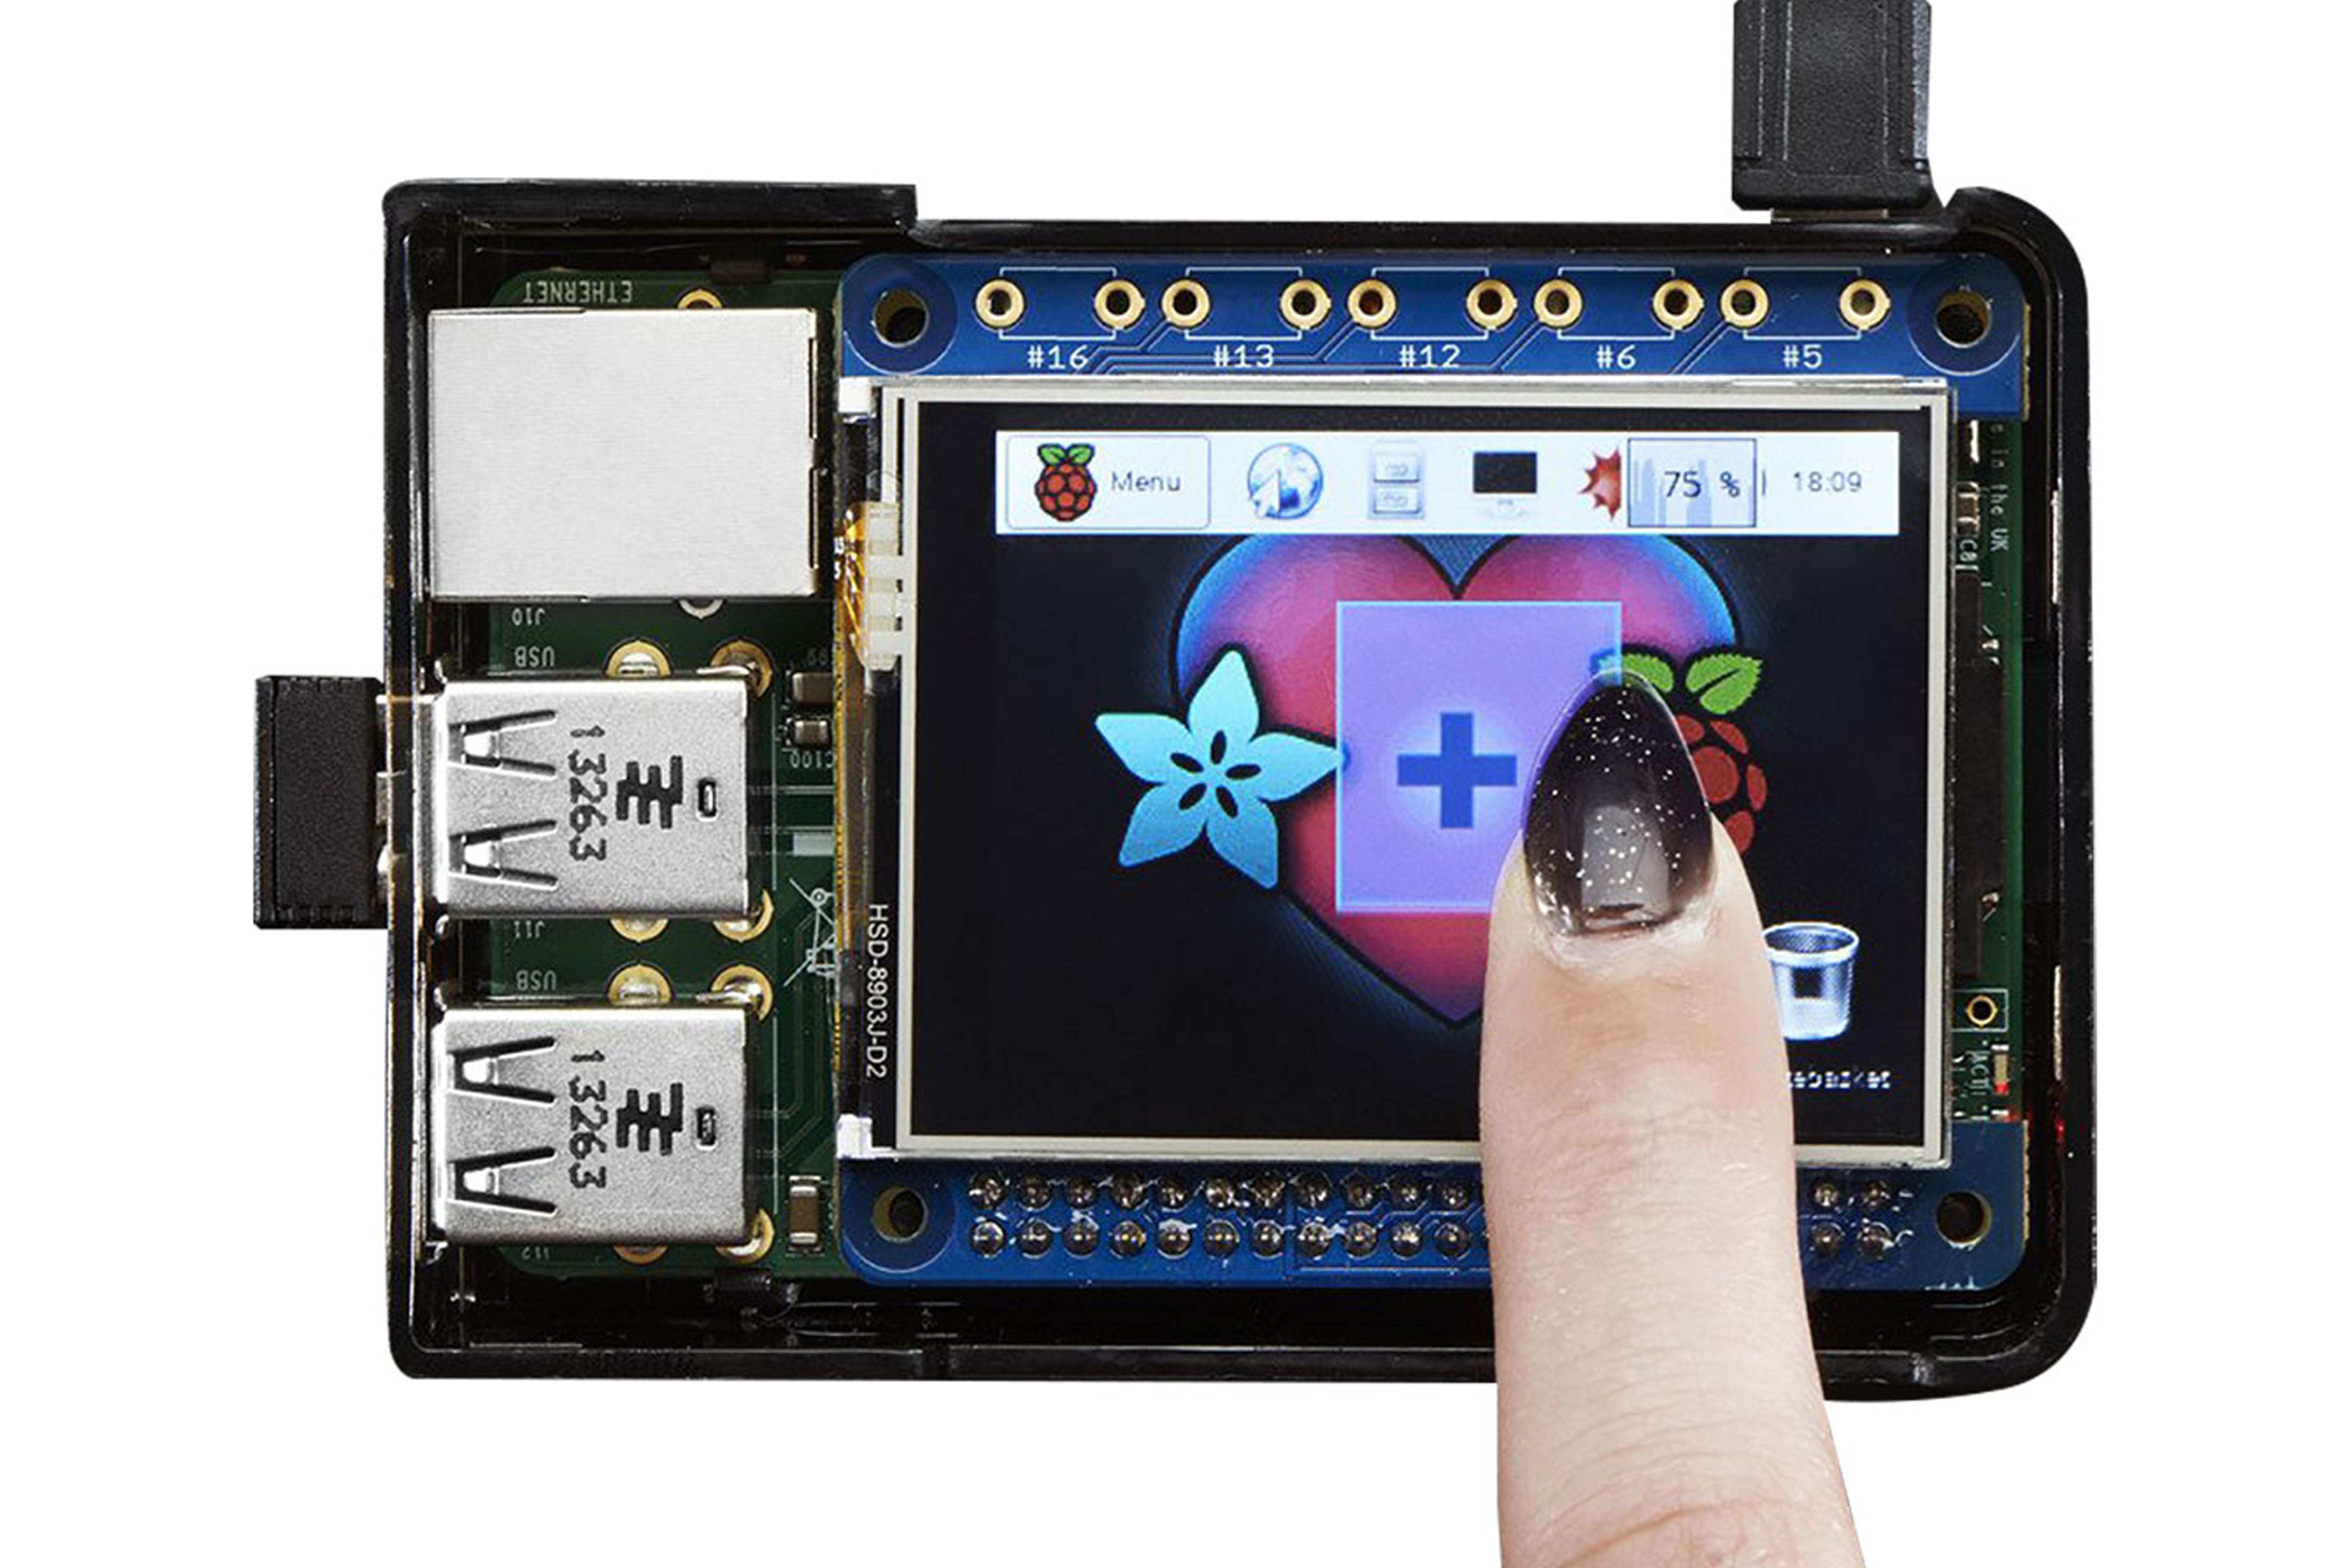 Adafruit PiTFT 2.4 Touchscreen Rasp HAT